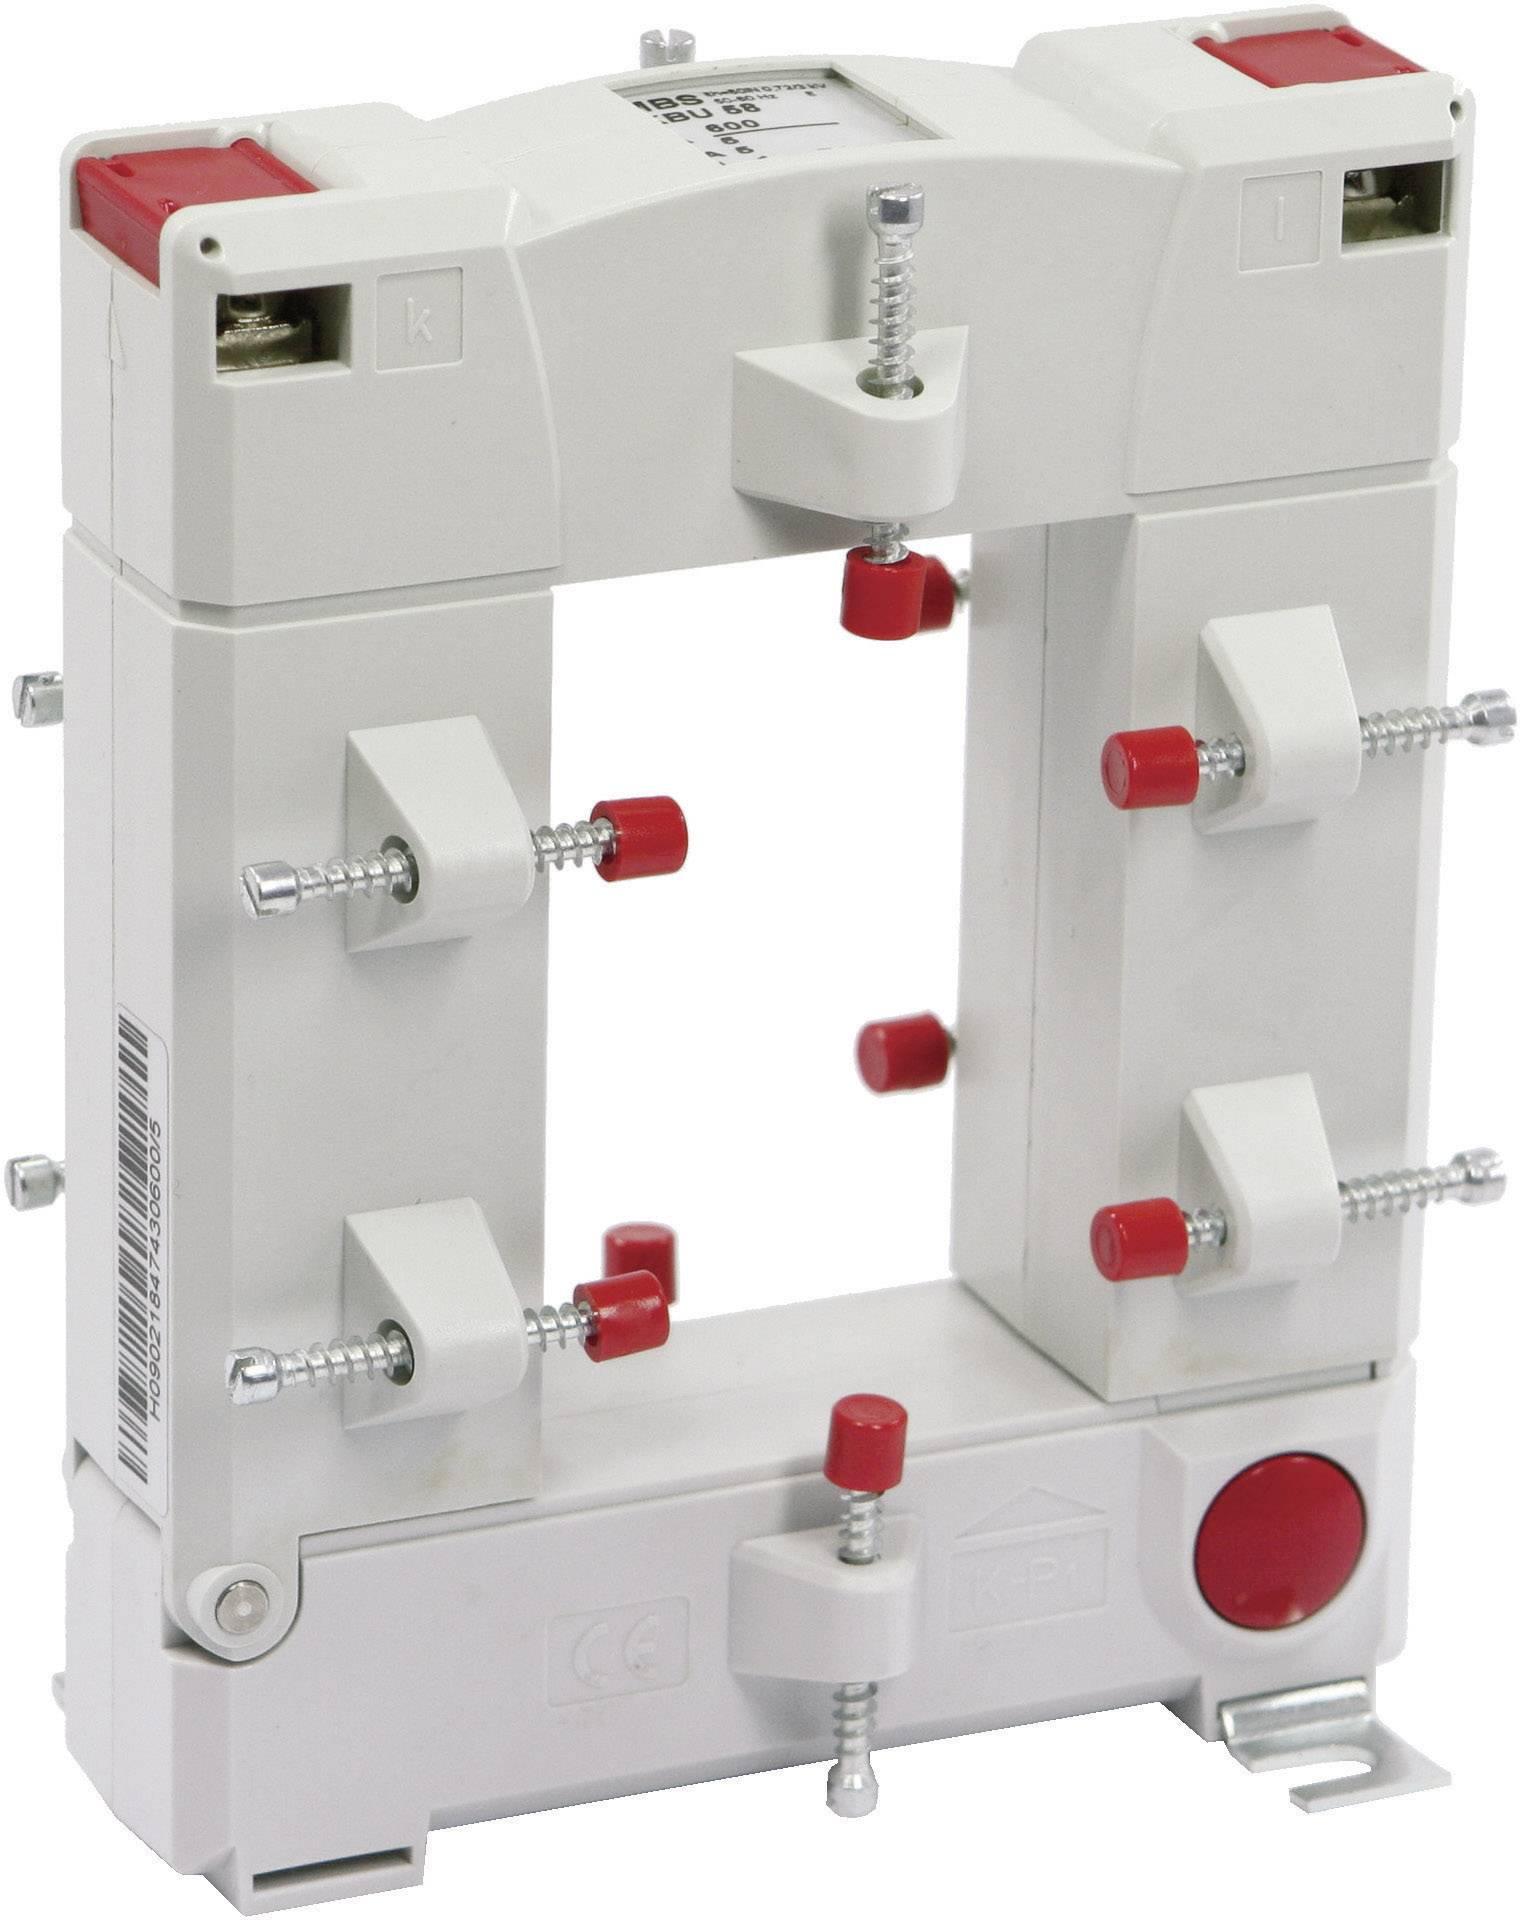 Zásuvný merací transformátor prúdu MBS KBU58 300/5A 2,5 VA KL.1